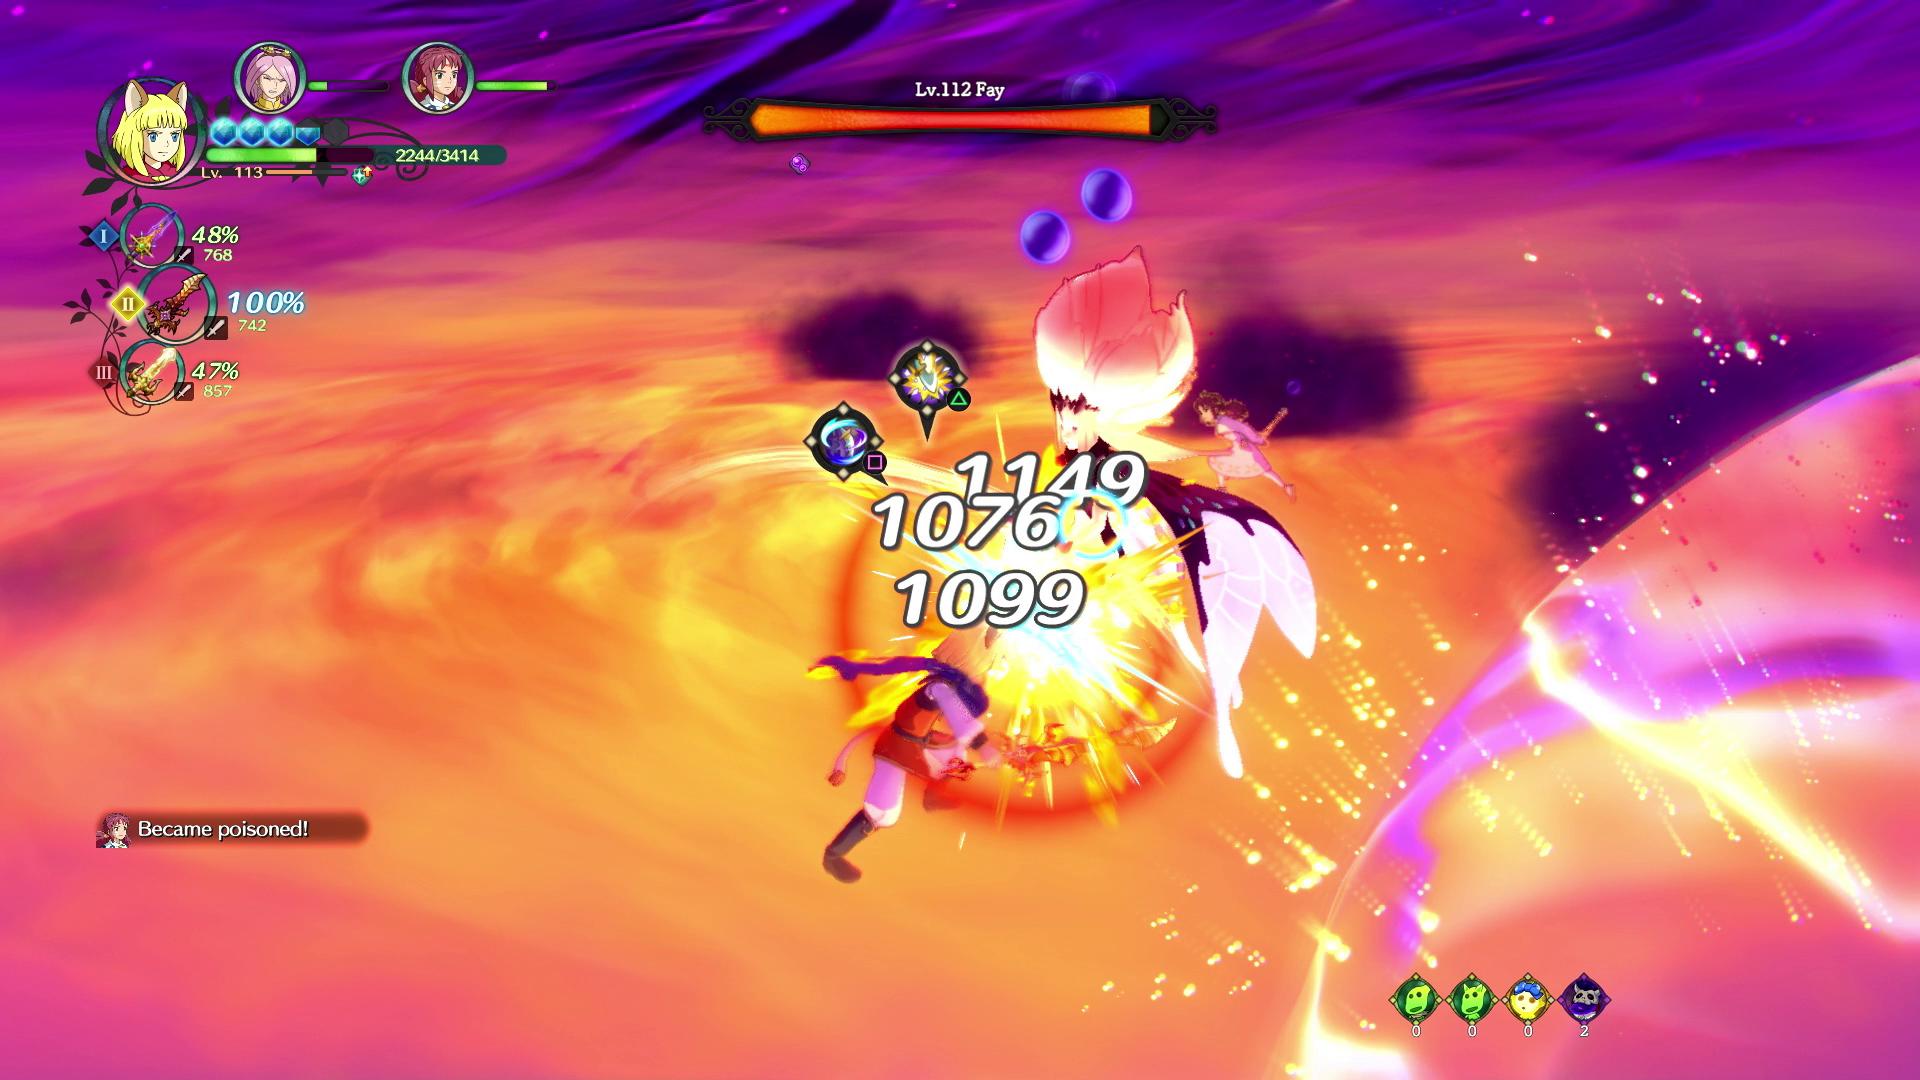 The Lair of the Lost Lord - Ni no Kuni 2: Revenant Kingdom DLC